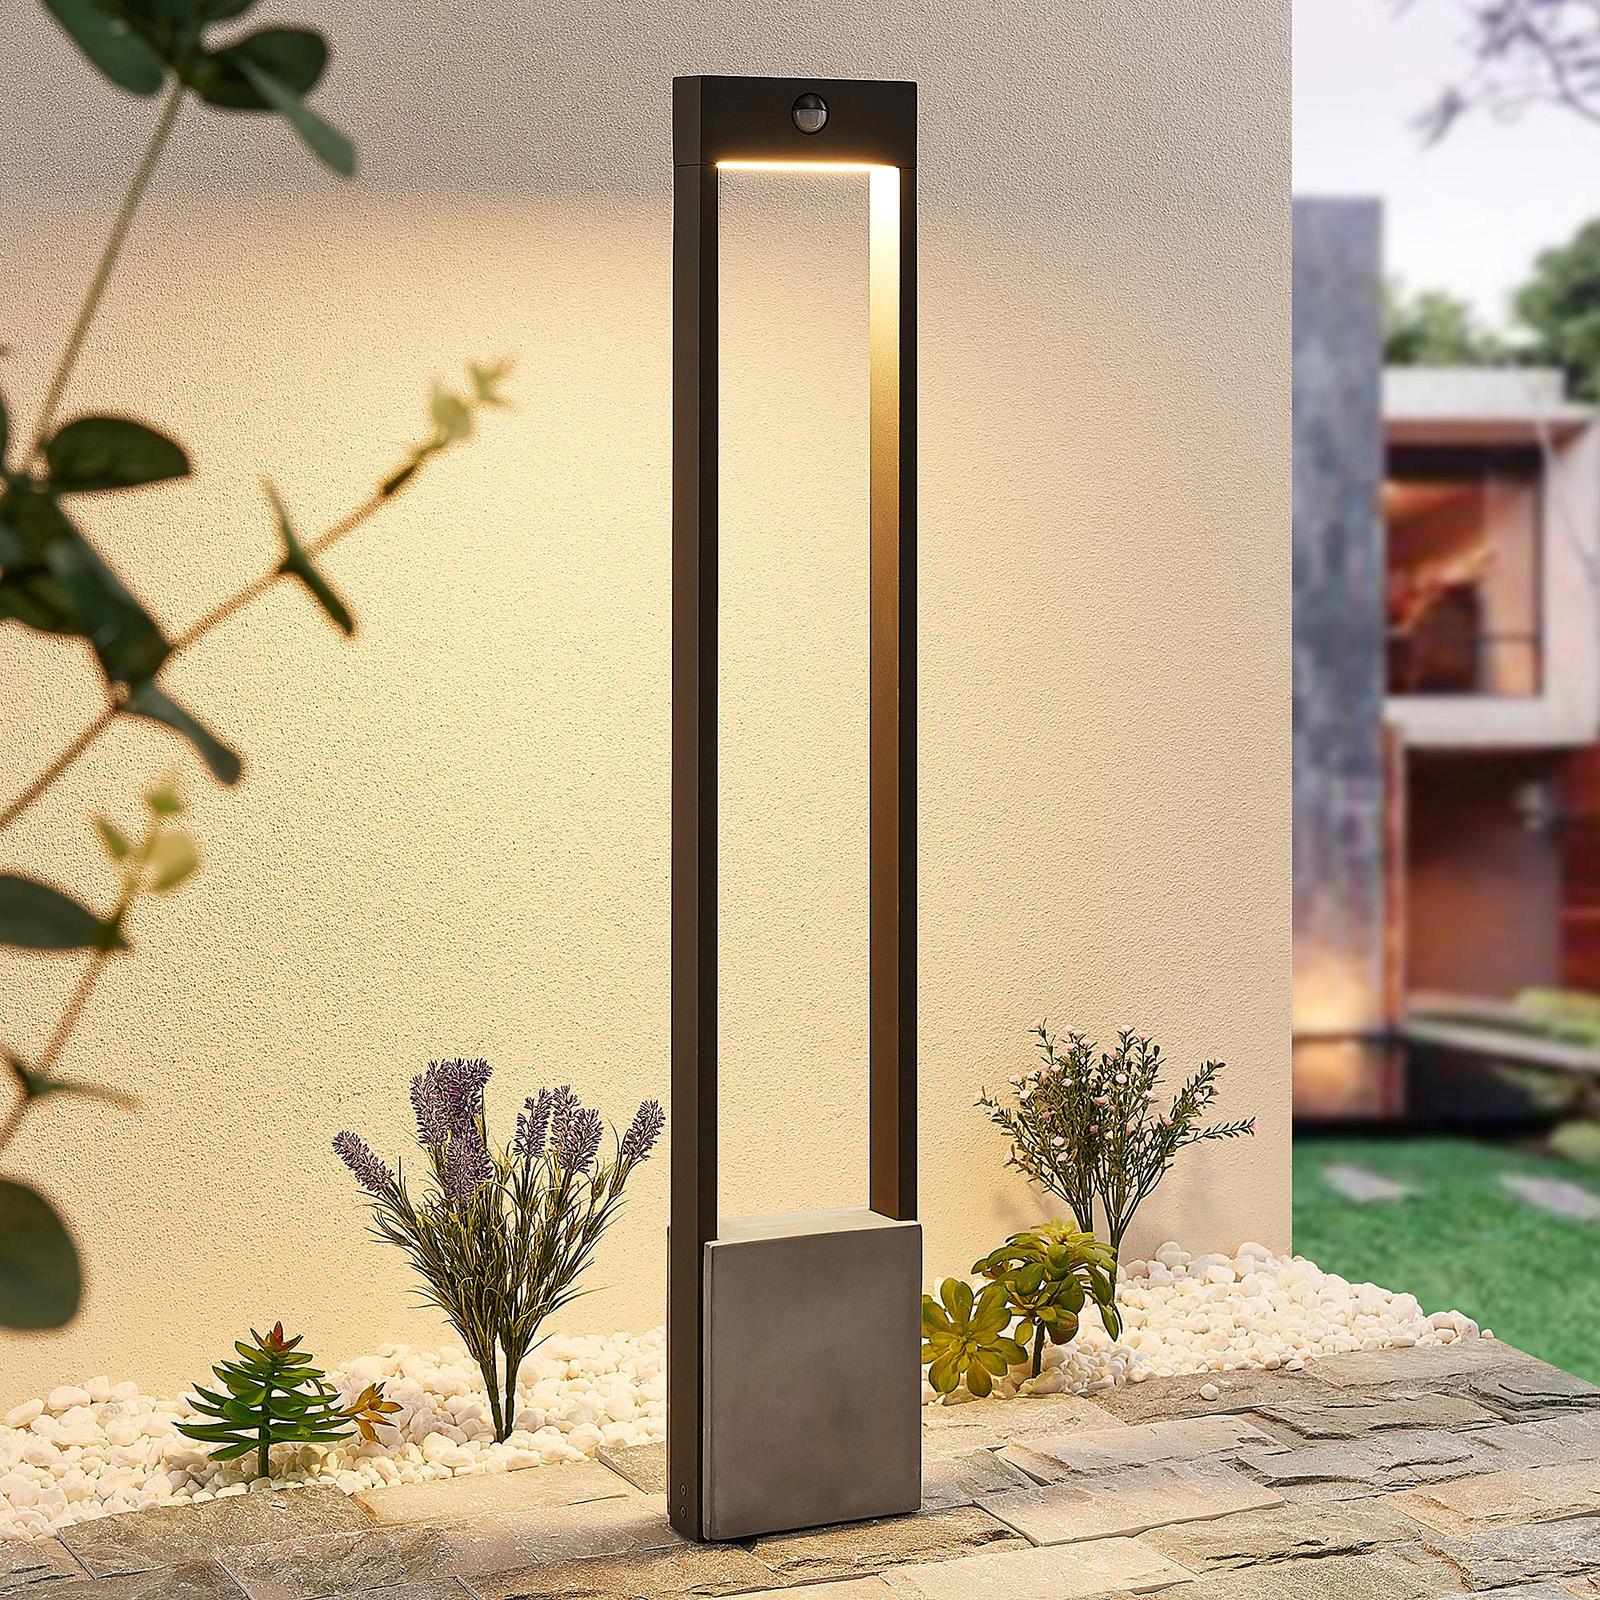 Lucande Tekiro słupek ogrodowy LED, 100 cm